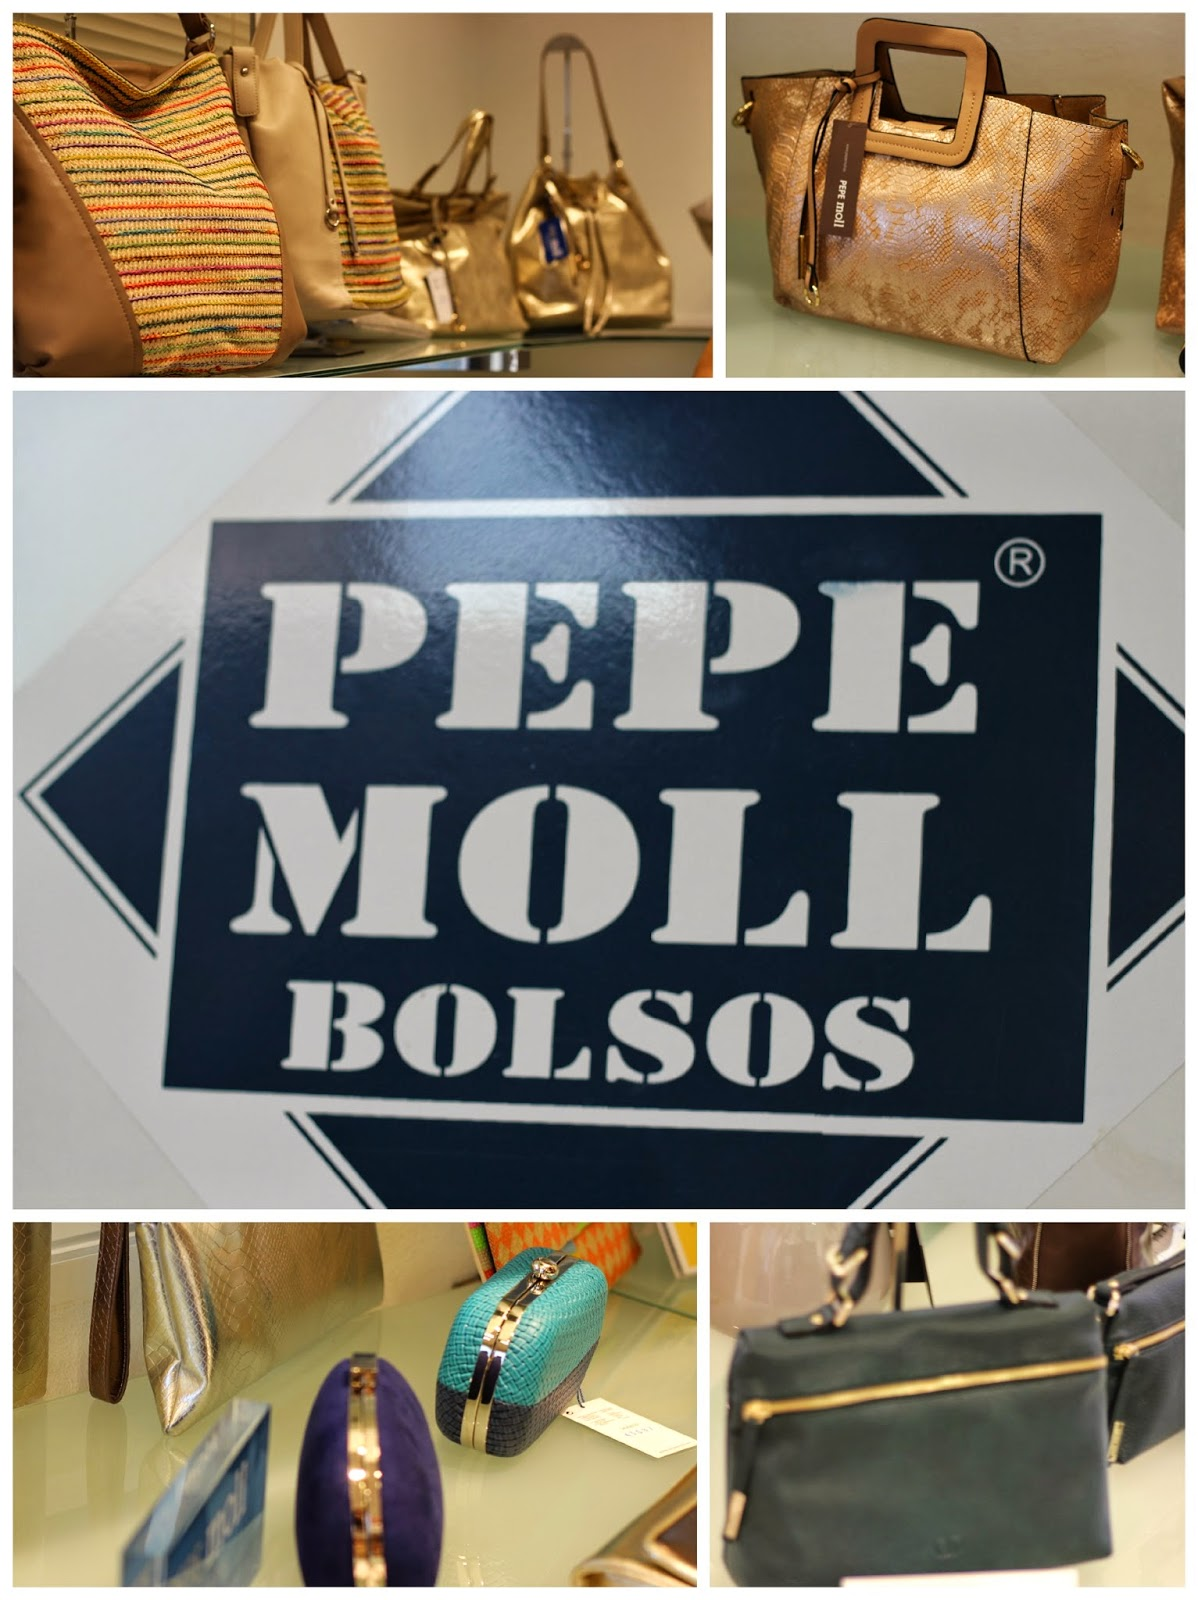 Pepe Moll Bolsos